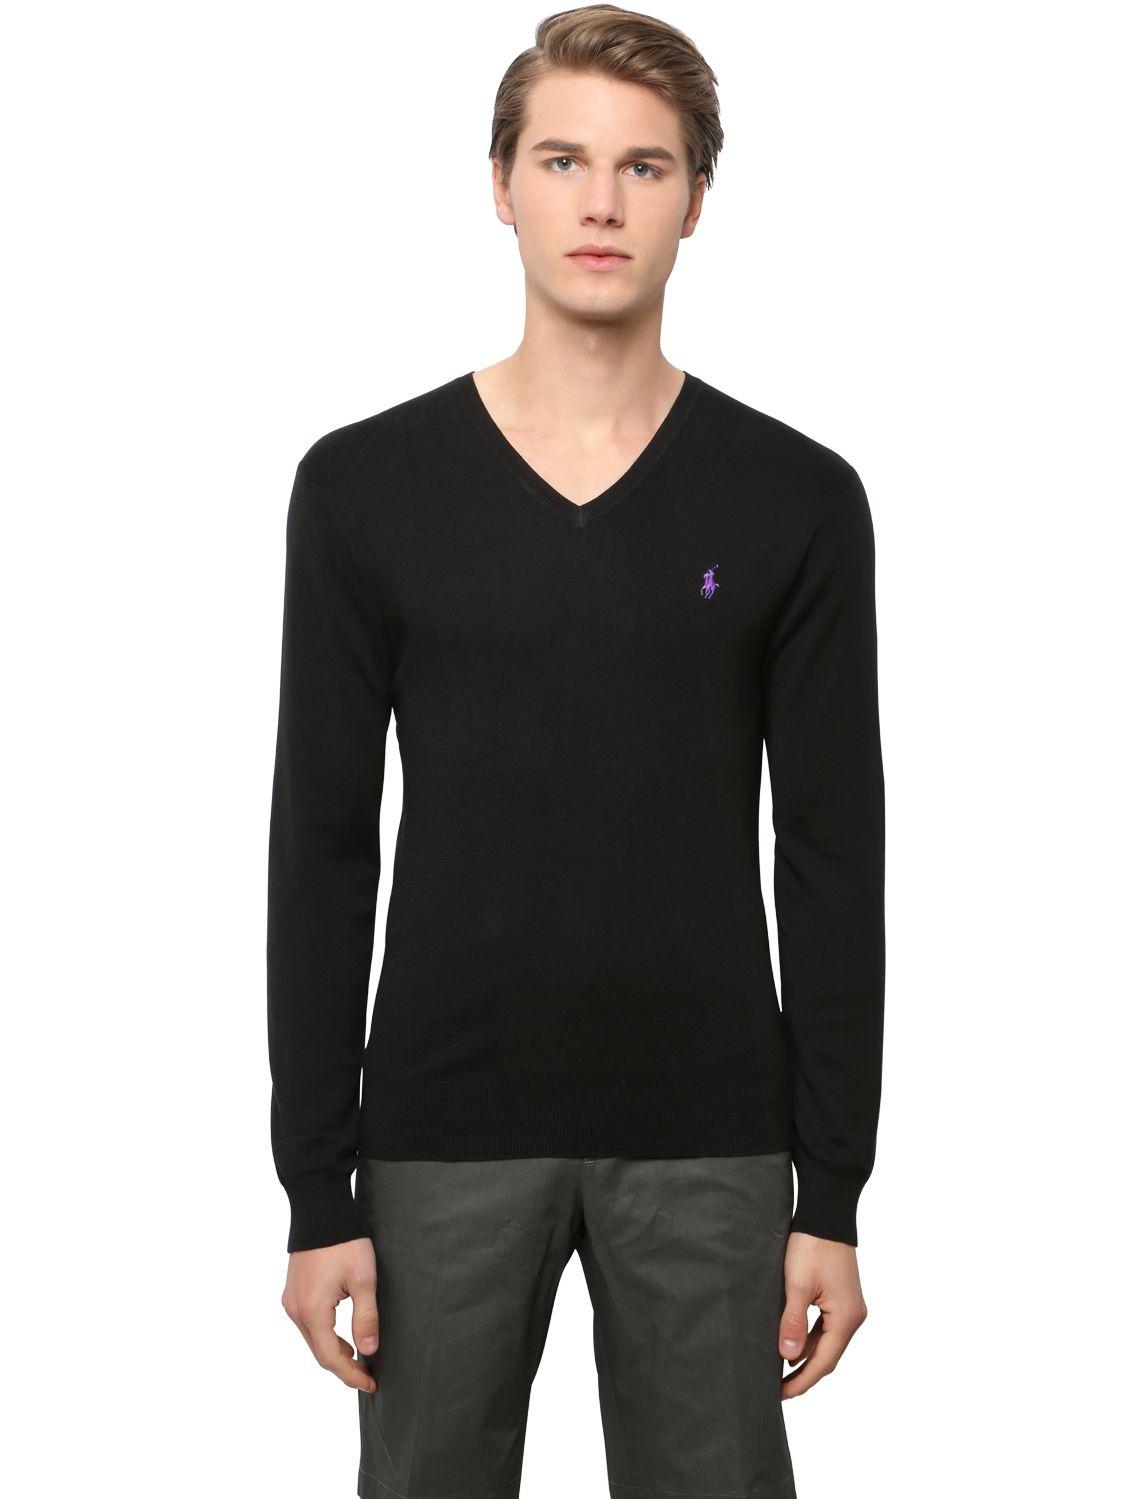 polo ralph lauren slim fit v neck pima cotton sweater in black for men lyst. Black Bedroom Furniture Sets. Home Design Ideas